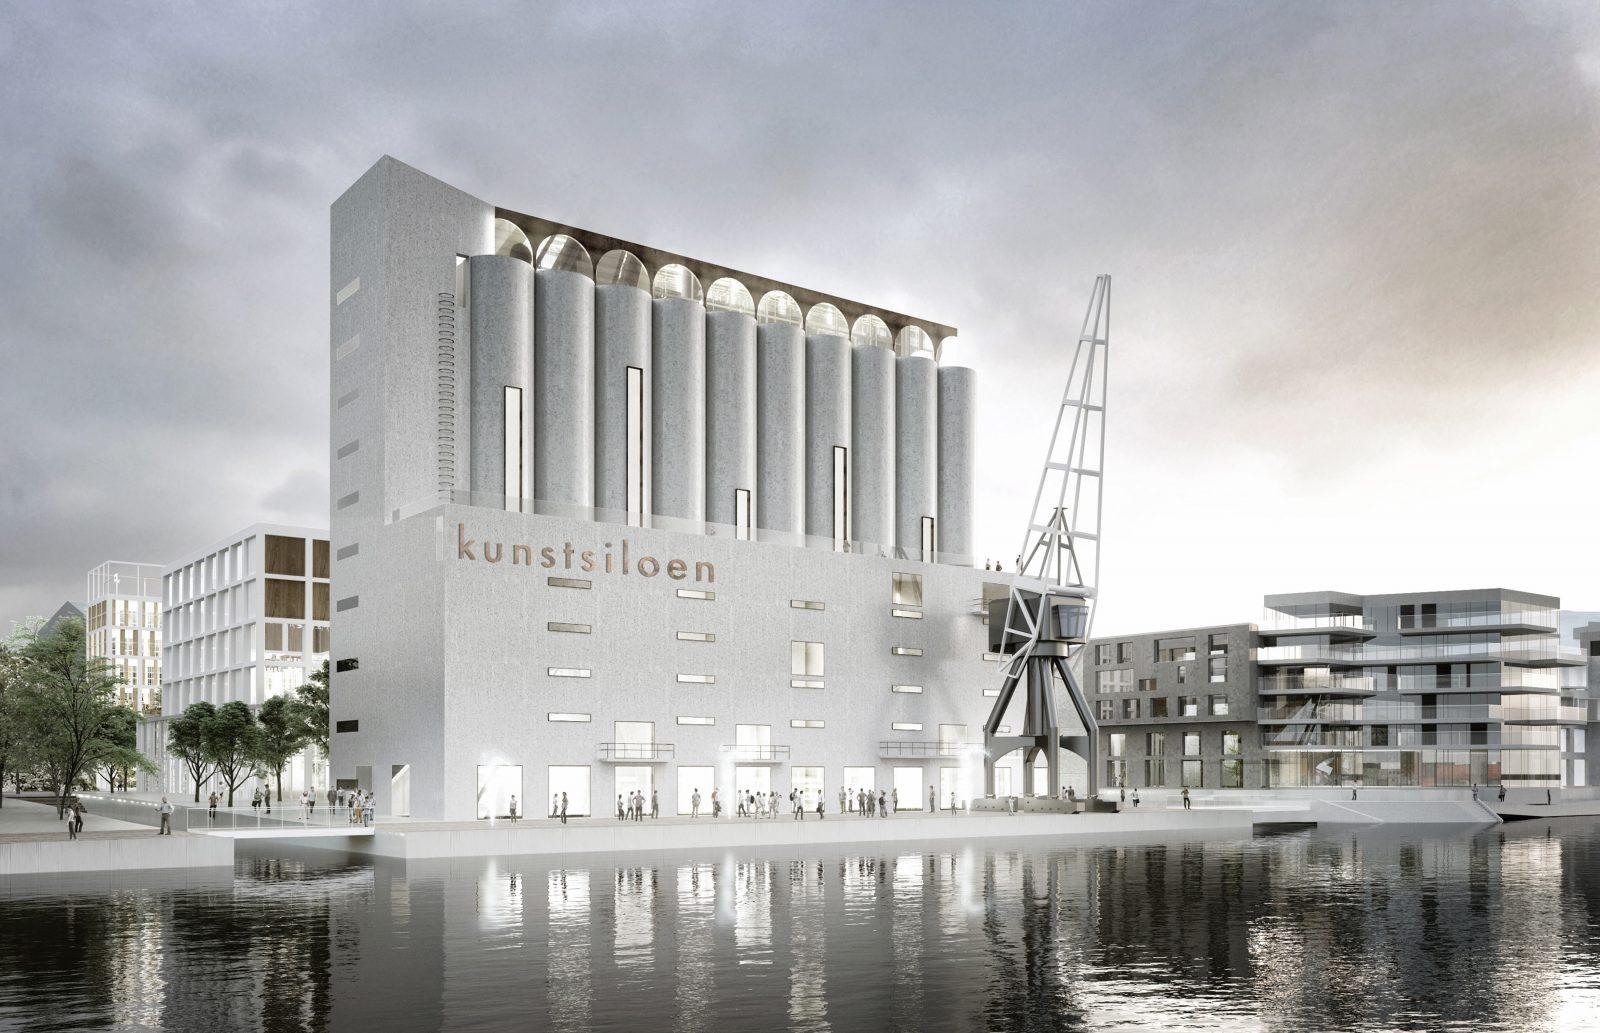 Kristiansand vyfranvatten beskuren